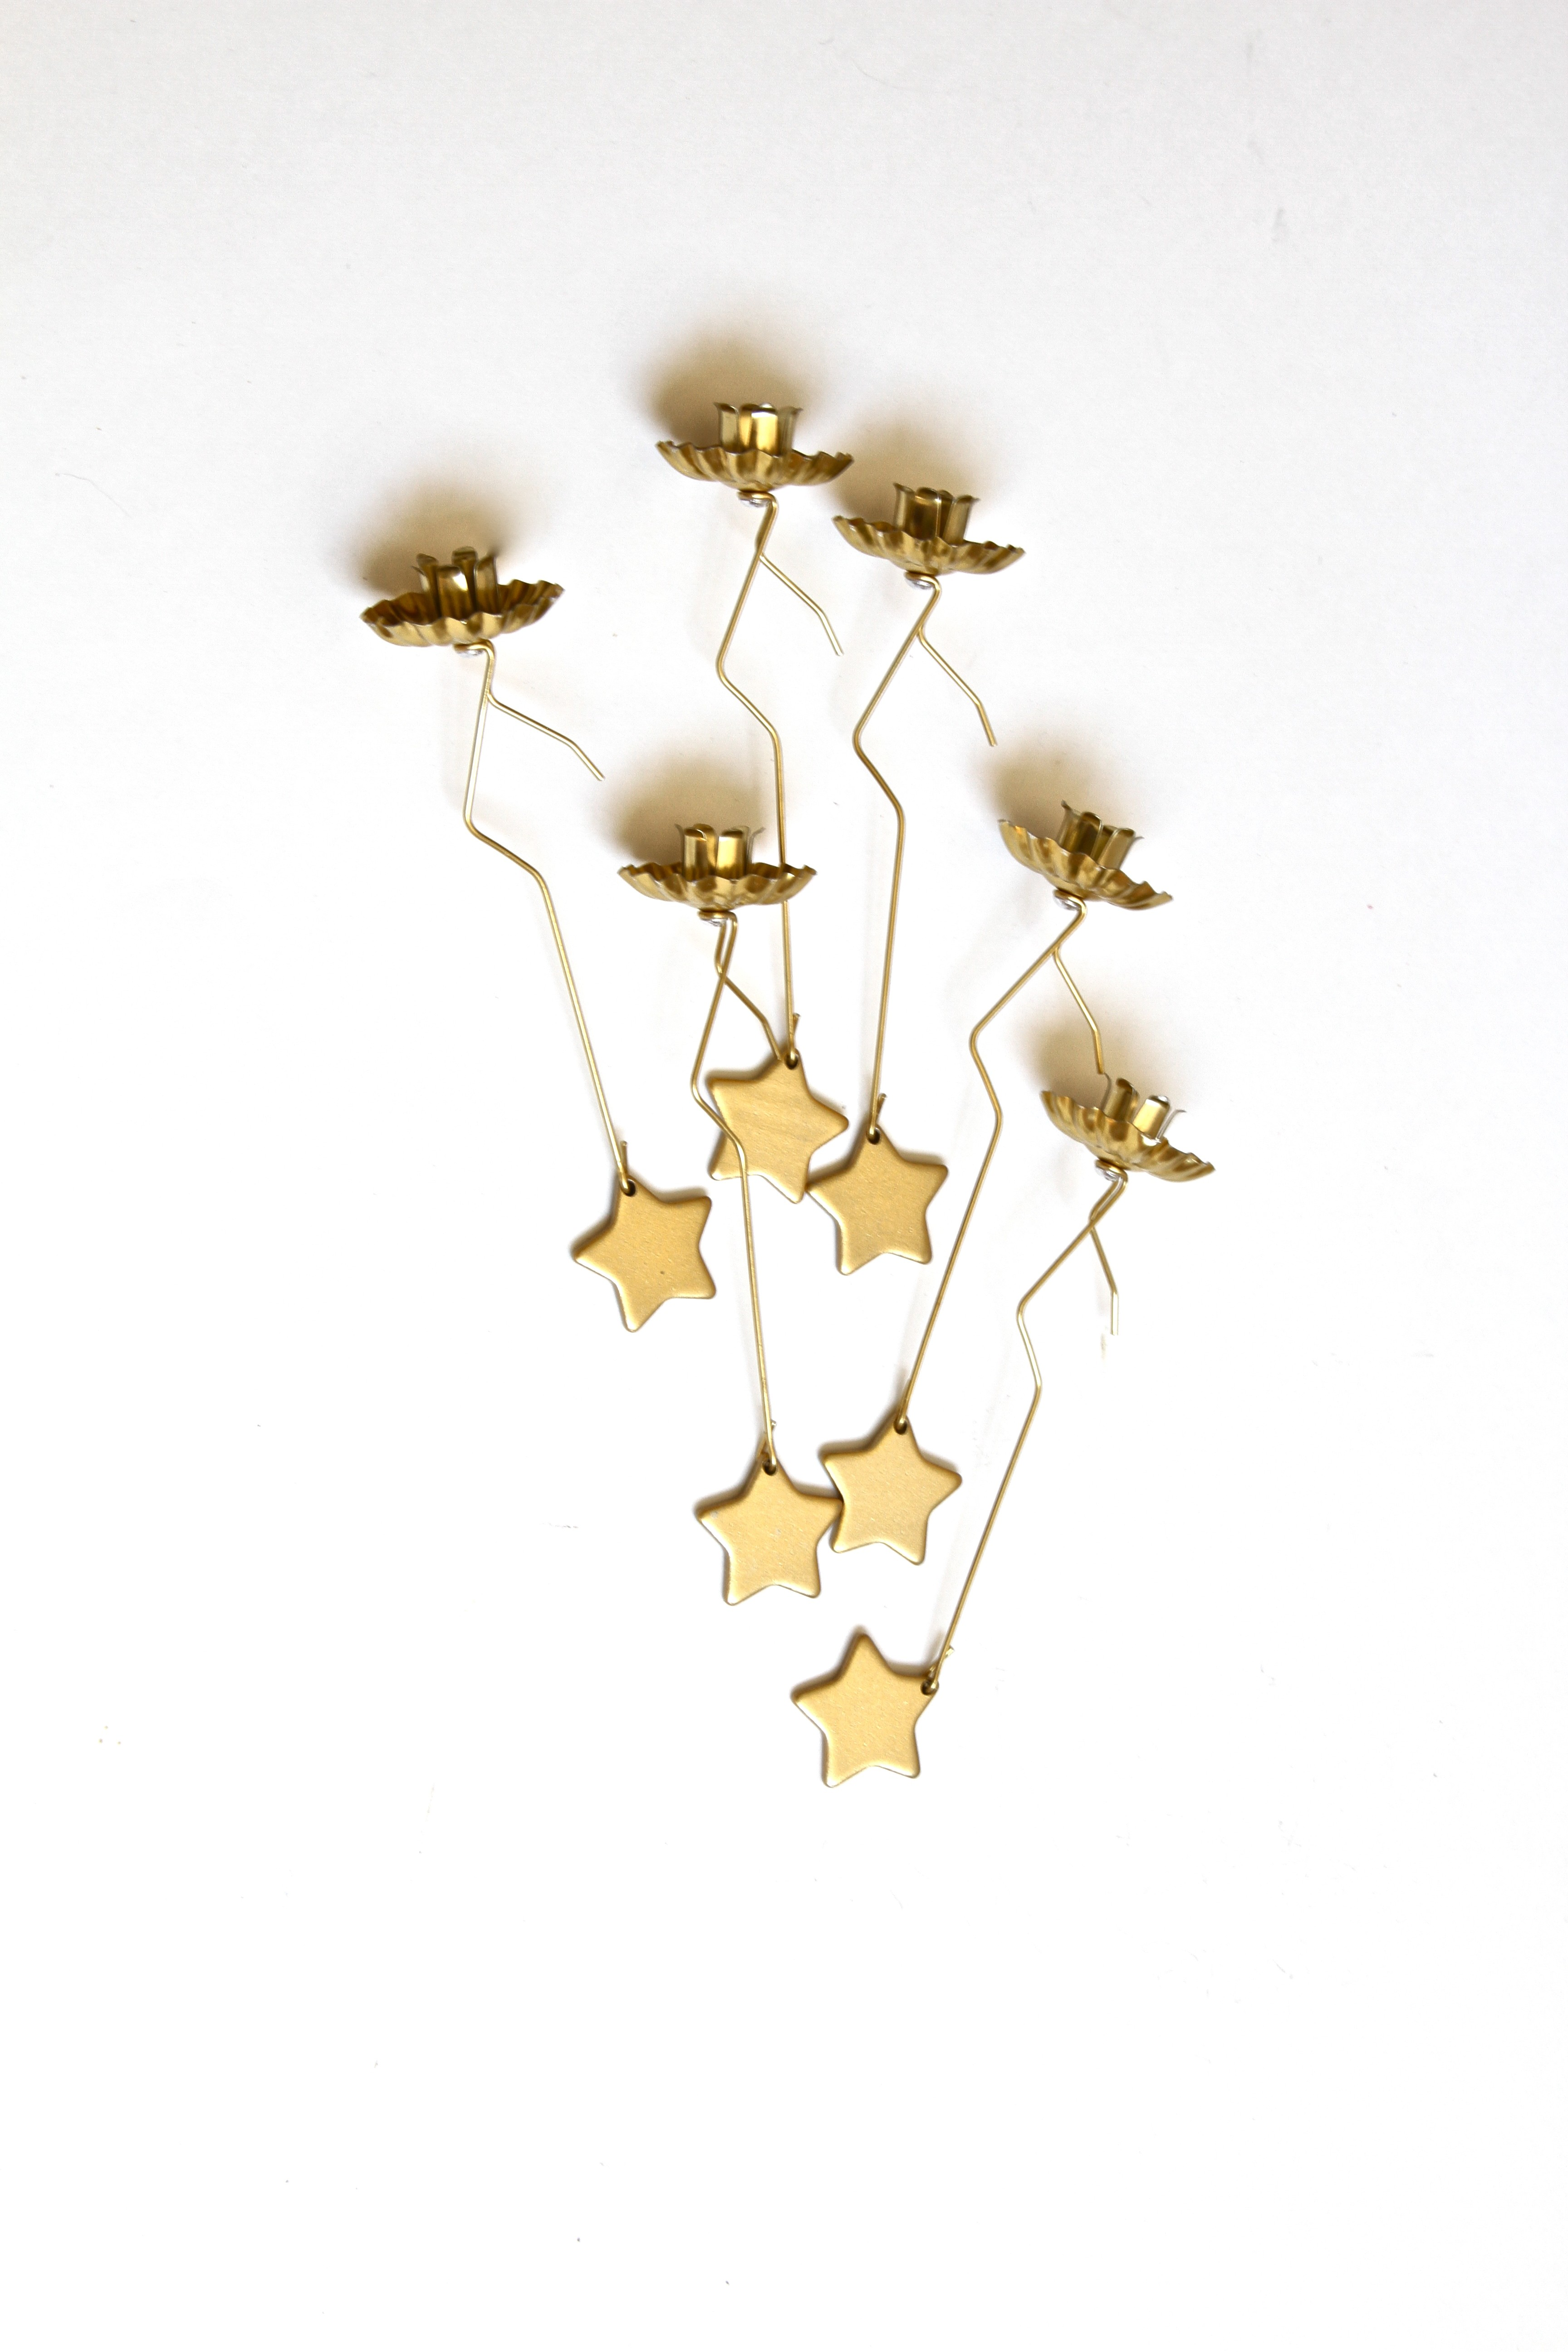 Christmas Tree Candle Holder.Pendulum Christmas Tree Candle Holder With Star Weight In Gold